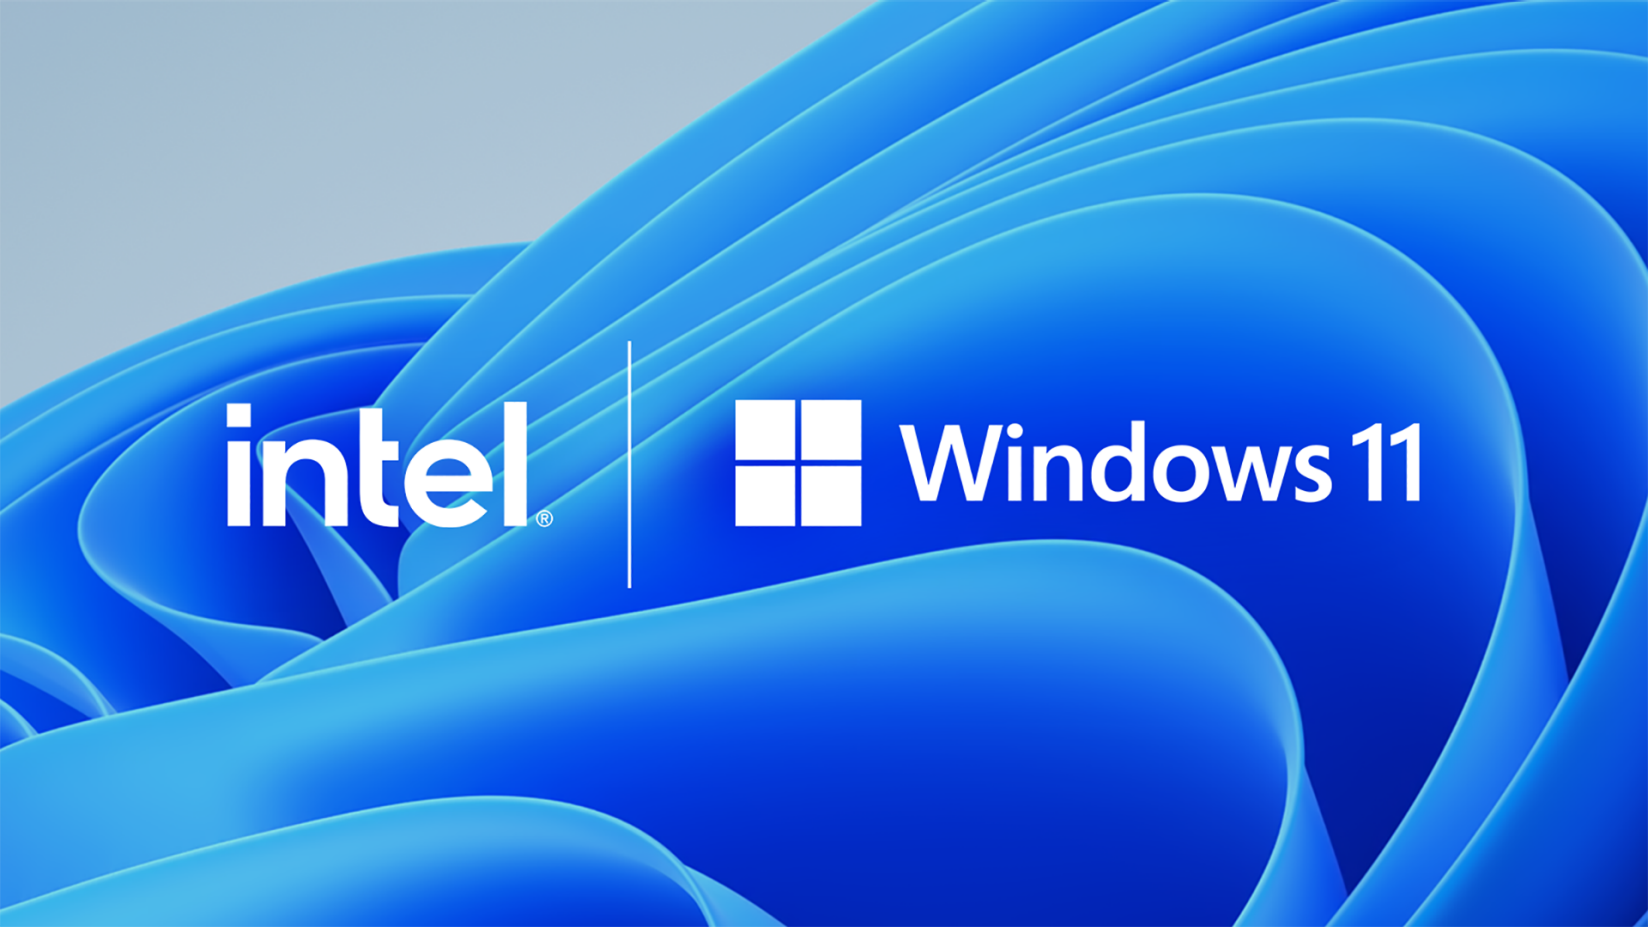 intel microsoft logos